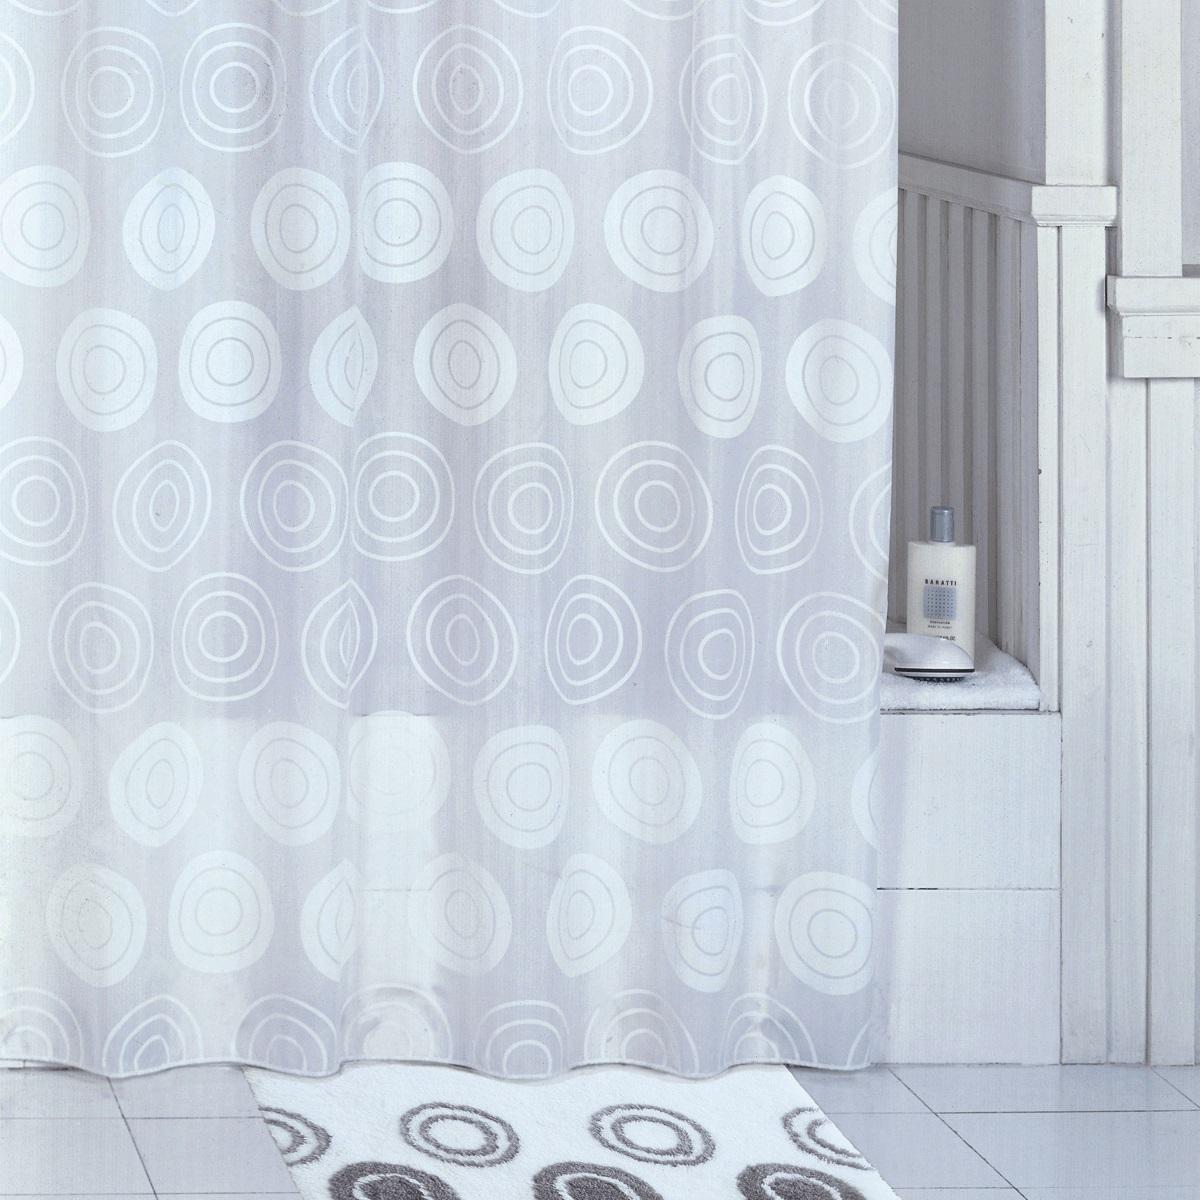 Штора для ванной Iddis Chequers White, цвет: белый, 200 x 200 см штора для ванной iddis blue butterfly цвет голубой 200 x 200 см